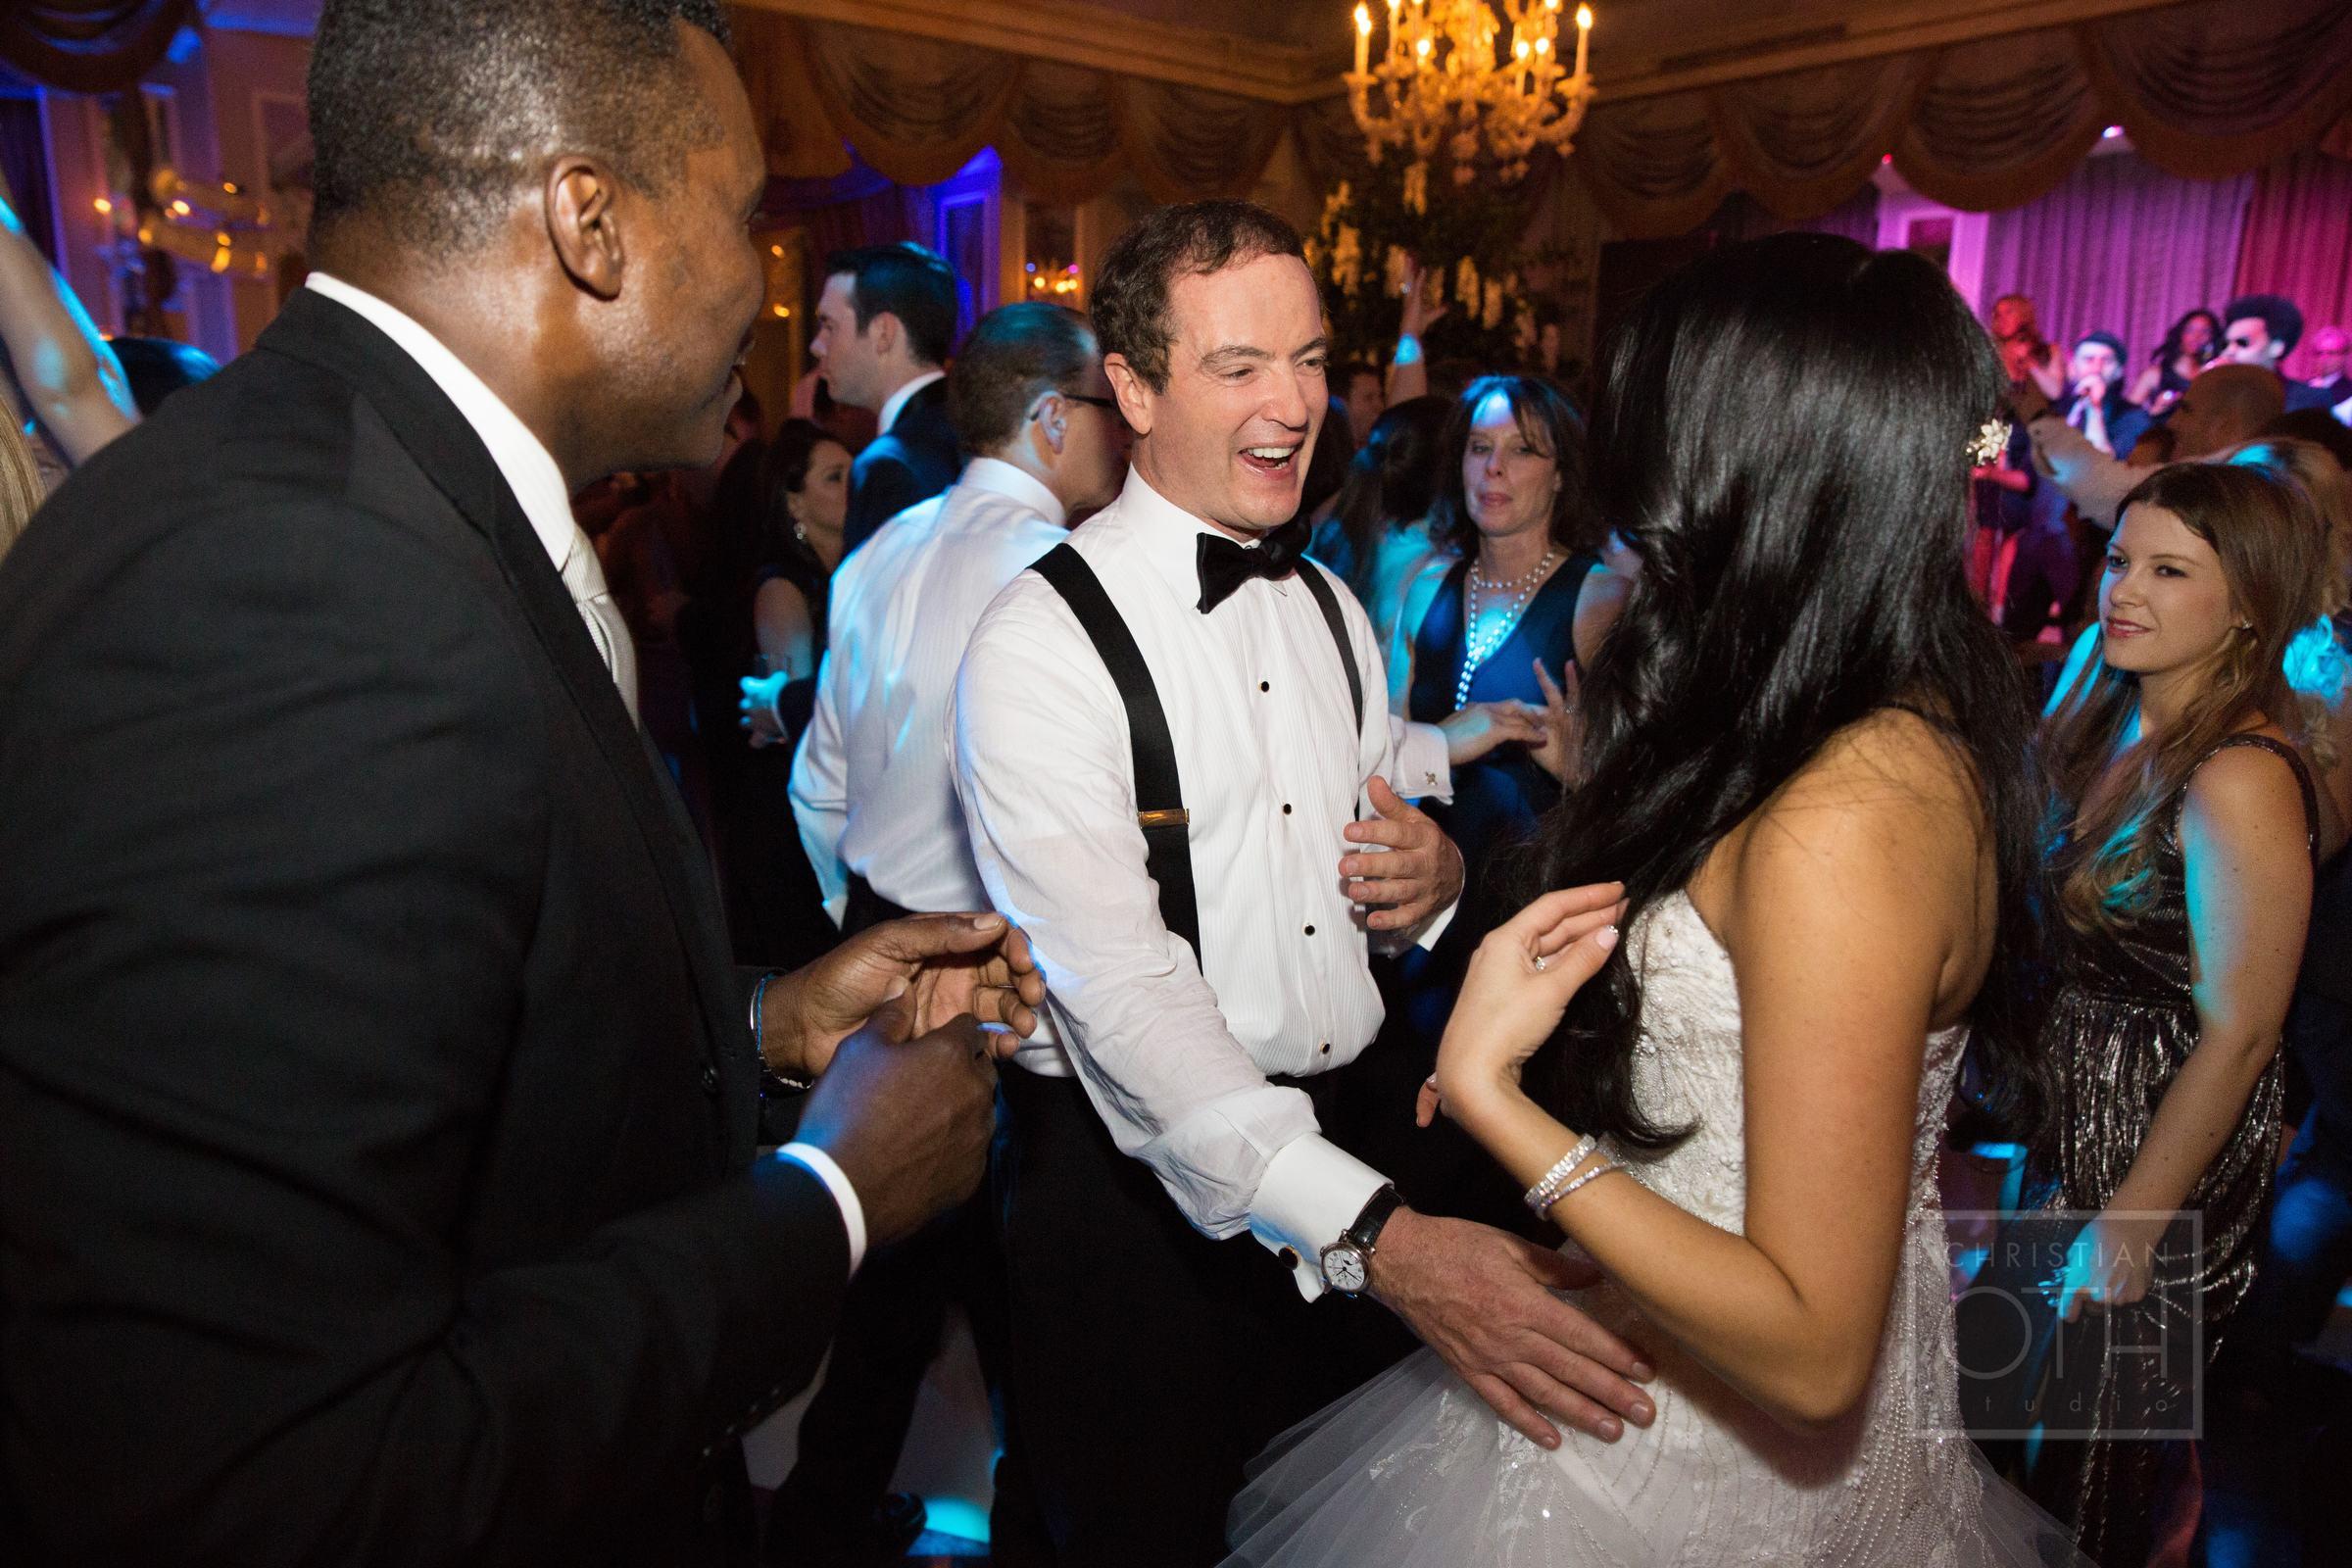 Ceci_New_York_Custom_Invitation_Pierre__City_ Destination_Wedding_Luxury_Personalized_Ceci_Style_Bride_Rose_Gold_Foil_Stamping185.JPG